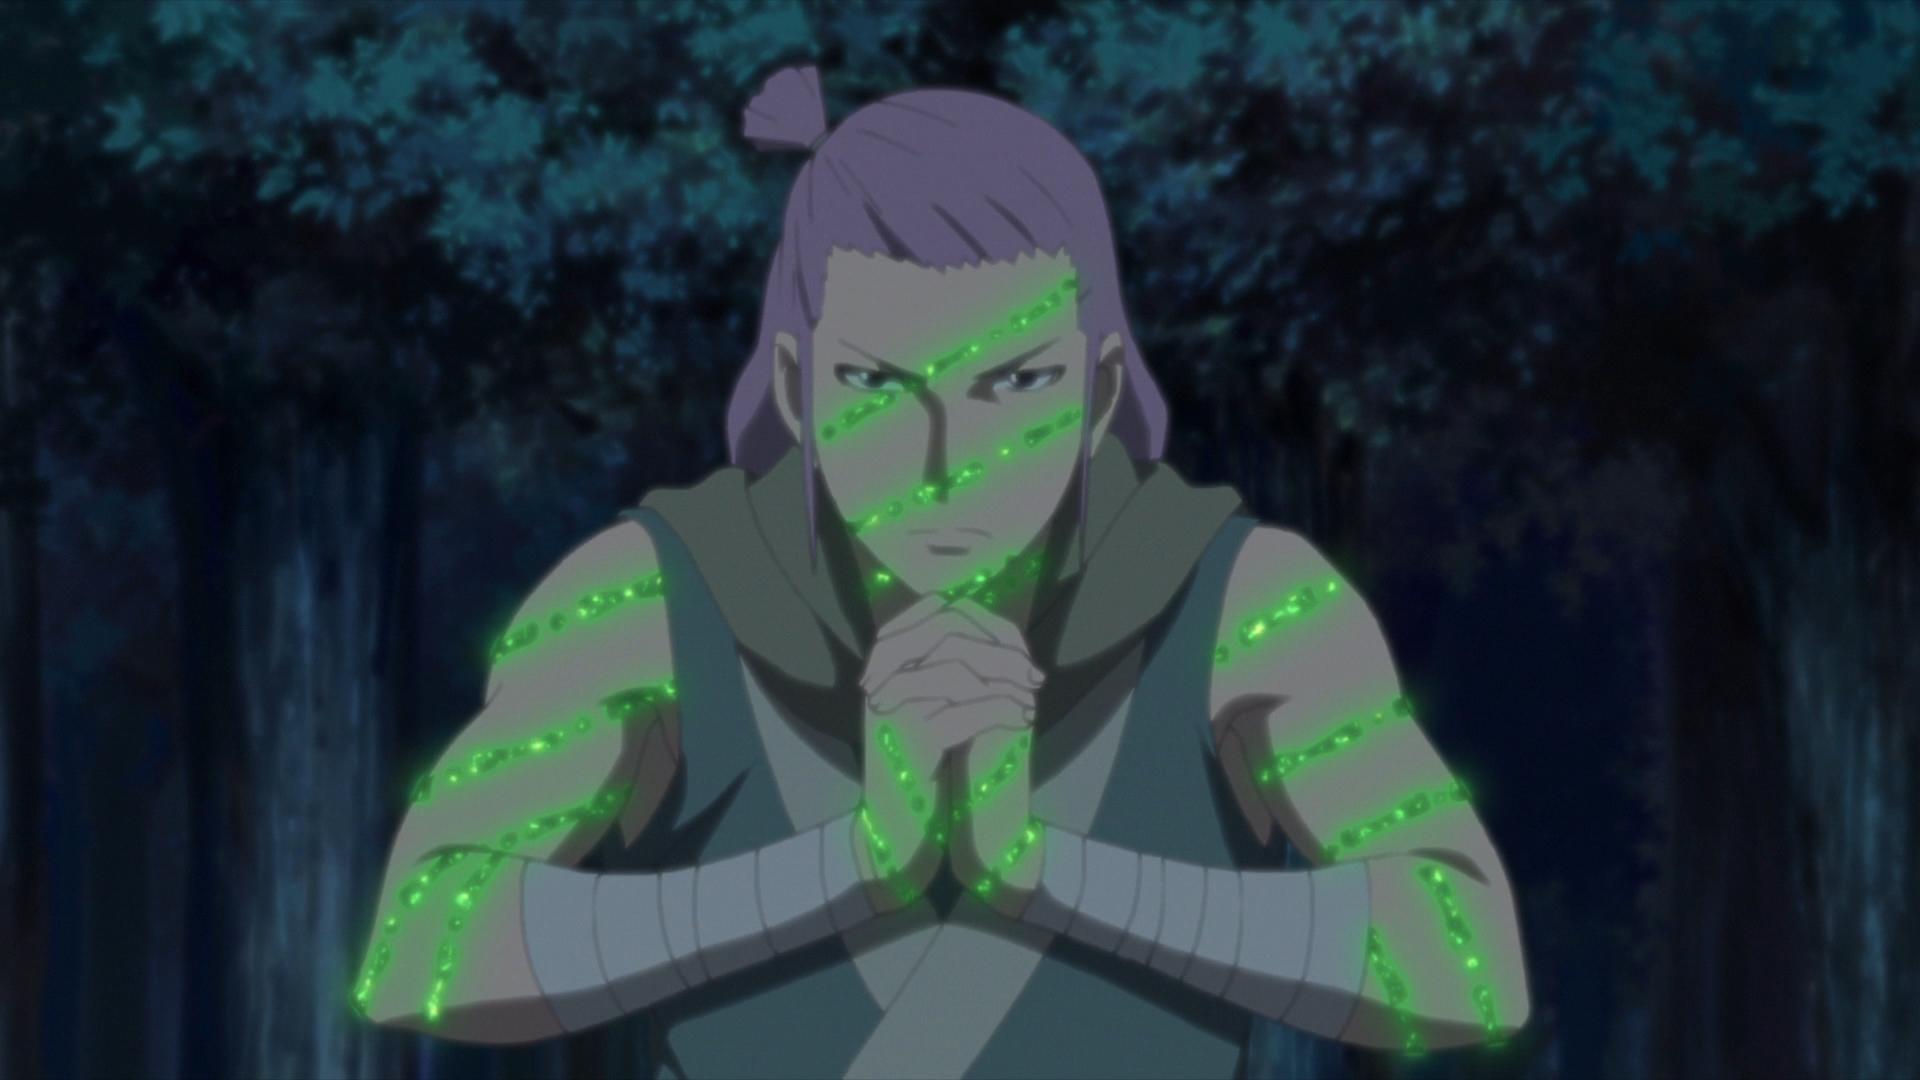 Arte Ninja da Neblina: Técnica Proibida: Extermínio do Submundo